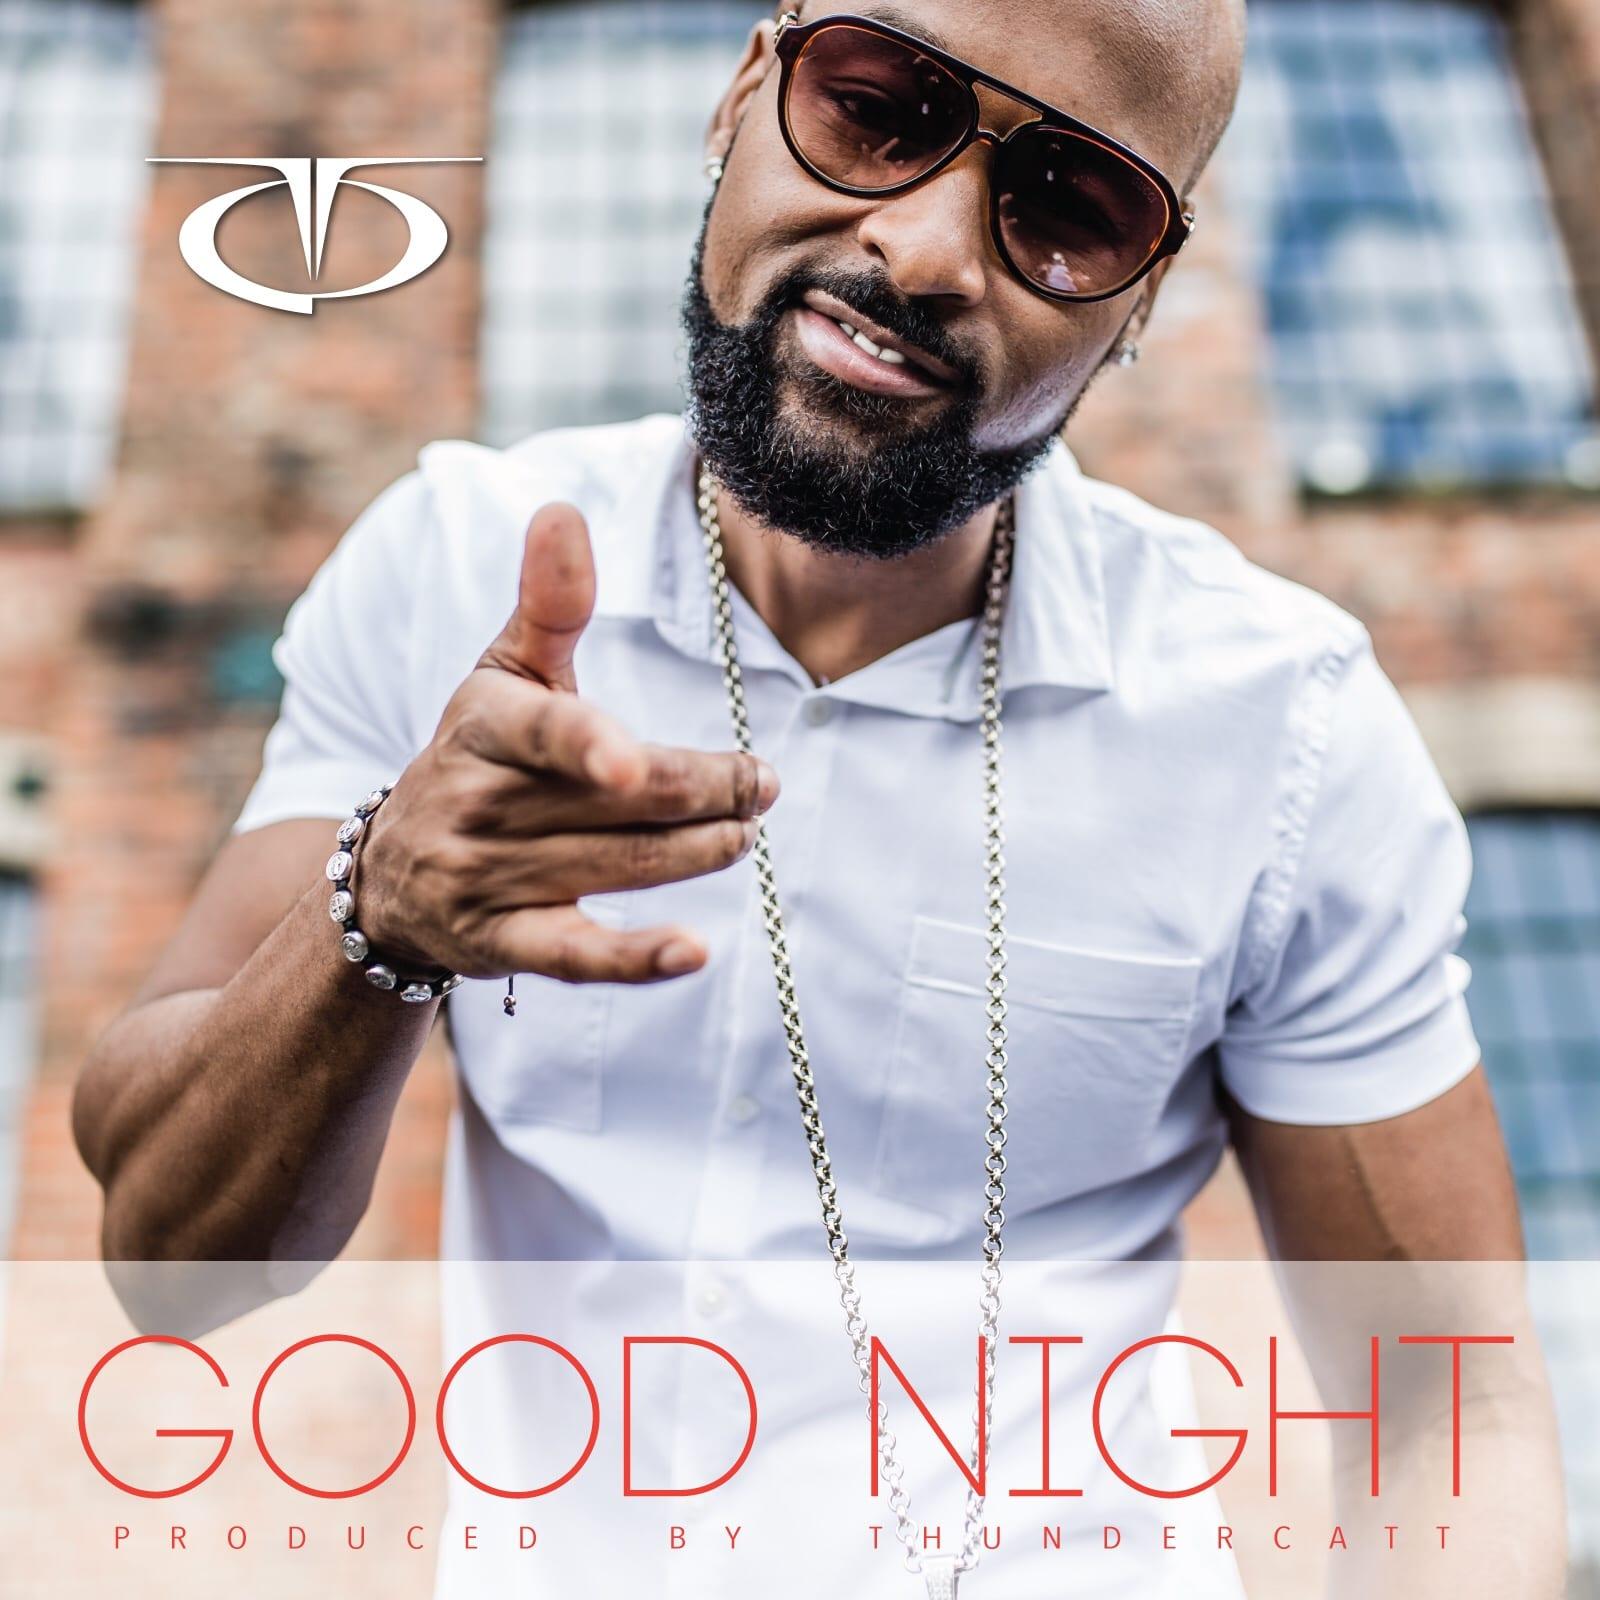 https://therealtq.com/wp-content/uploads/2018/06/good-night1.jpg